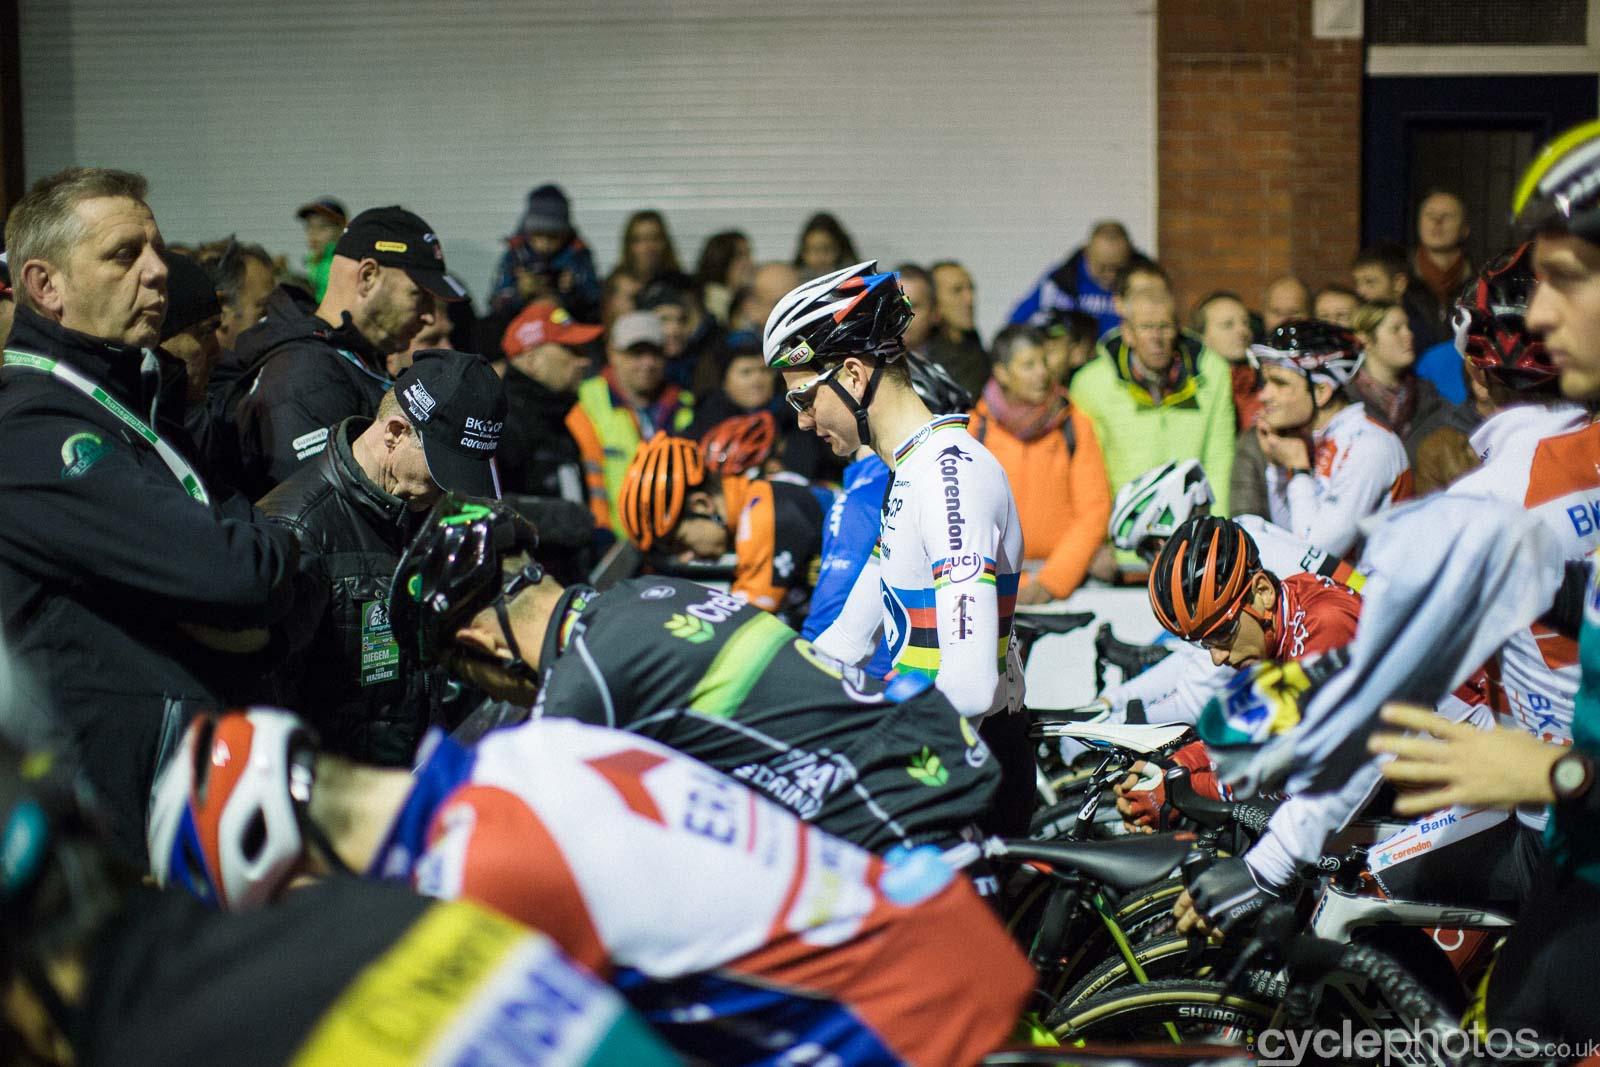 2015-cyclephotos-cyclocross-diegem-172213-mathieu-van-der-poel